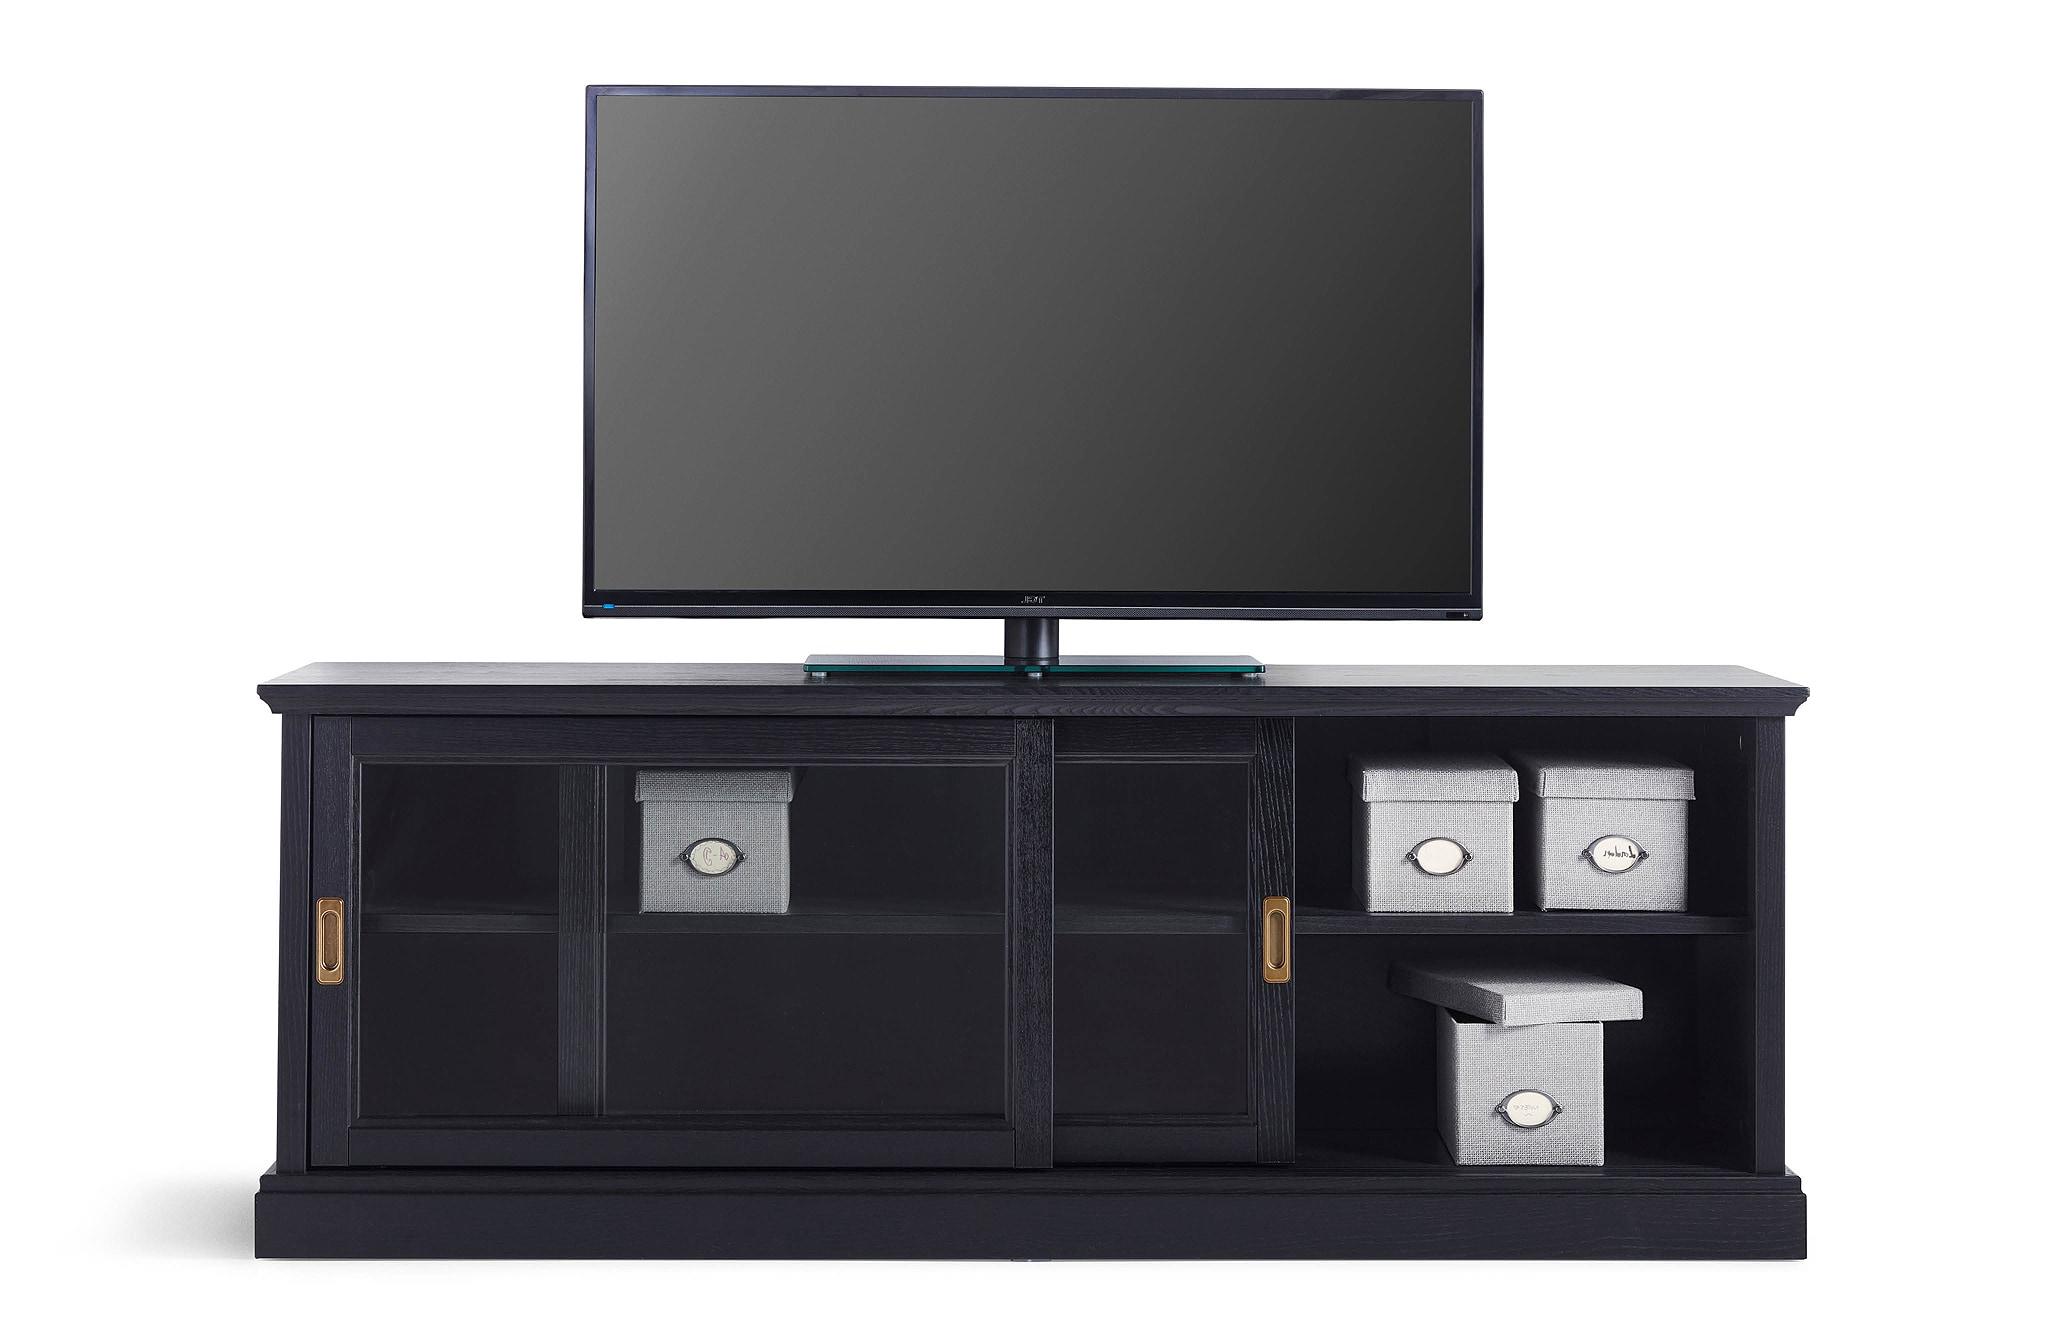 Mesas Tv Ikea Etdg Muebles De Tv Y Muebles Para El Salà N Pra Online Ikea